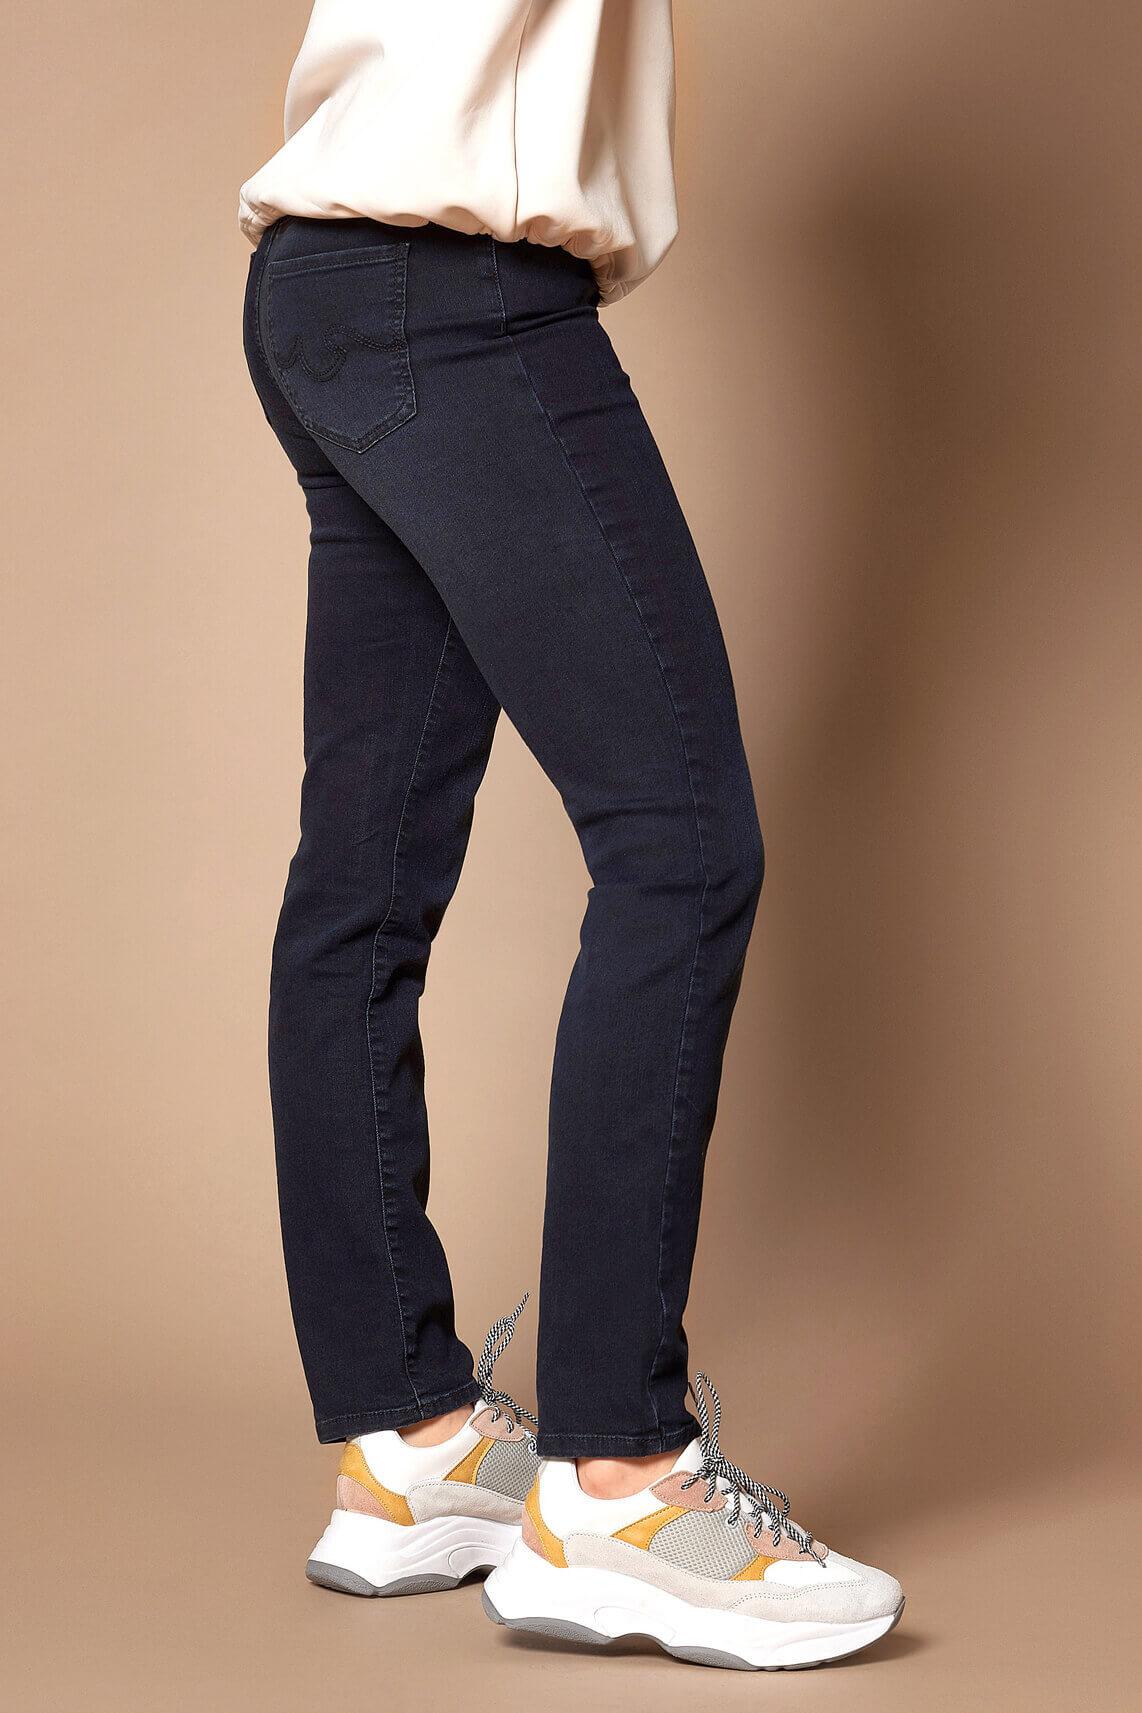 Rosner Dames Audrey jeans Blauw